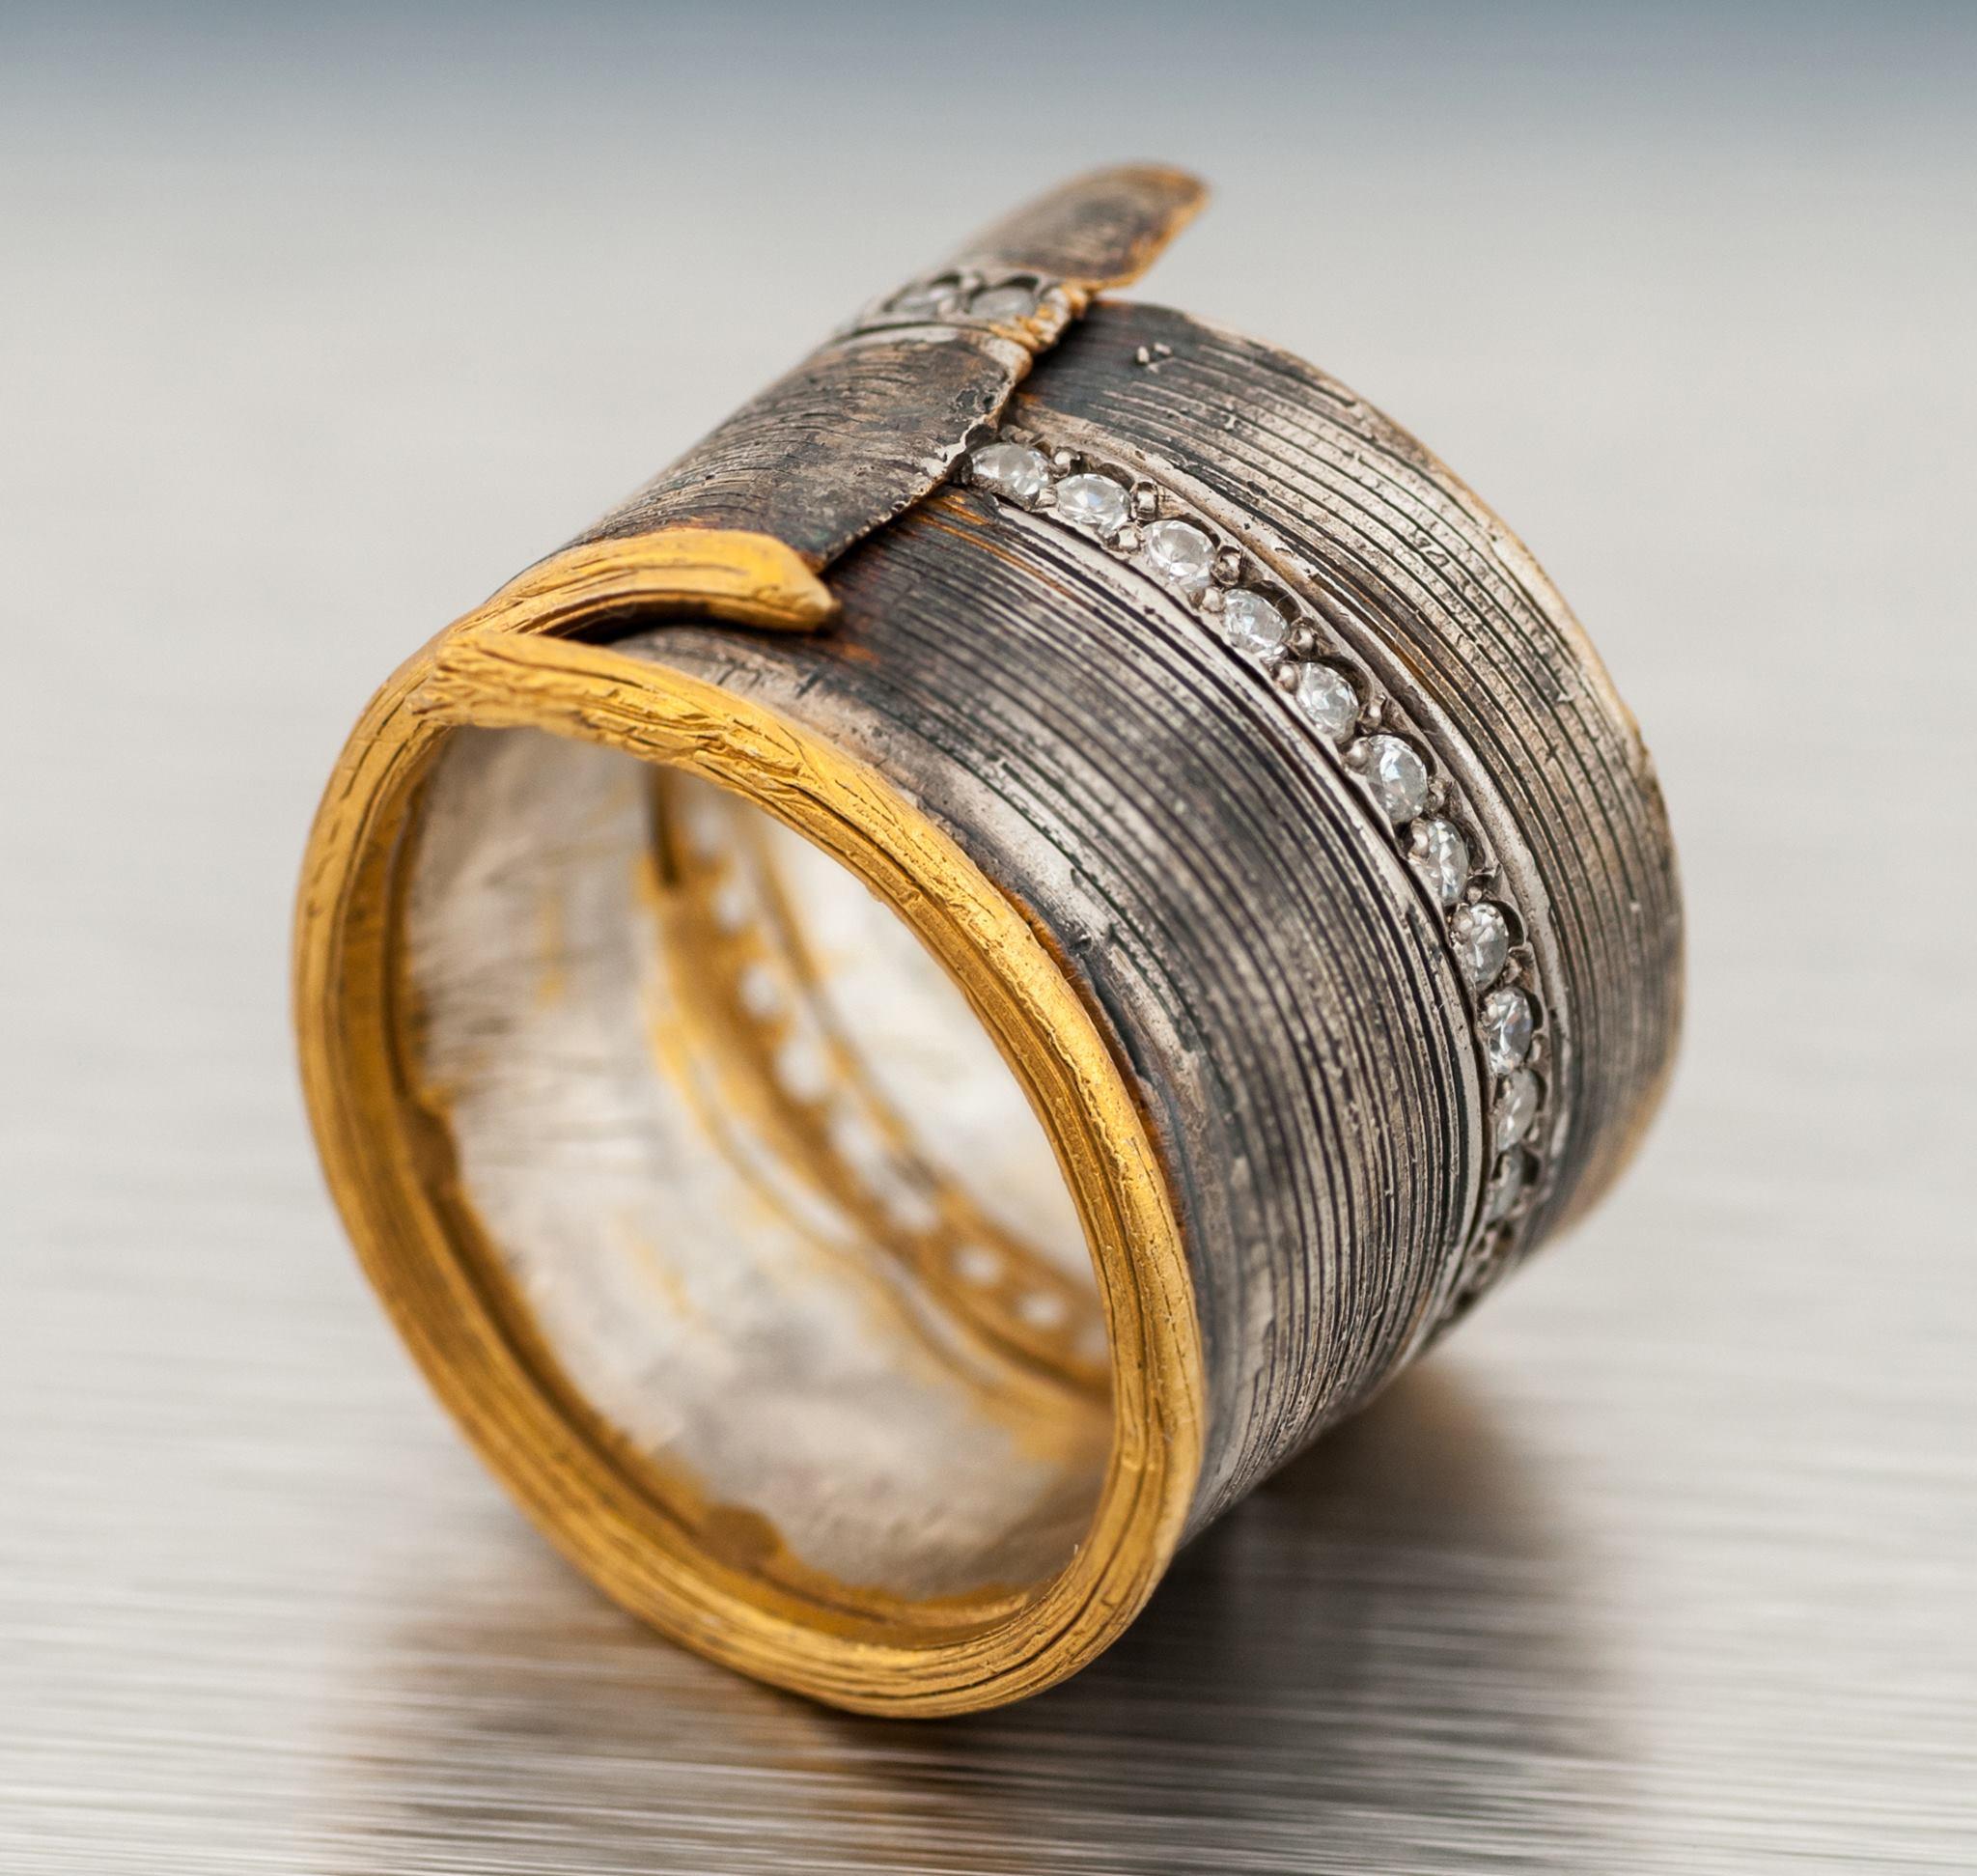 David Chkheidze's Original Ring Design